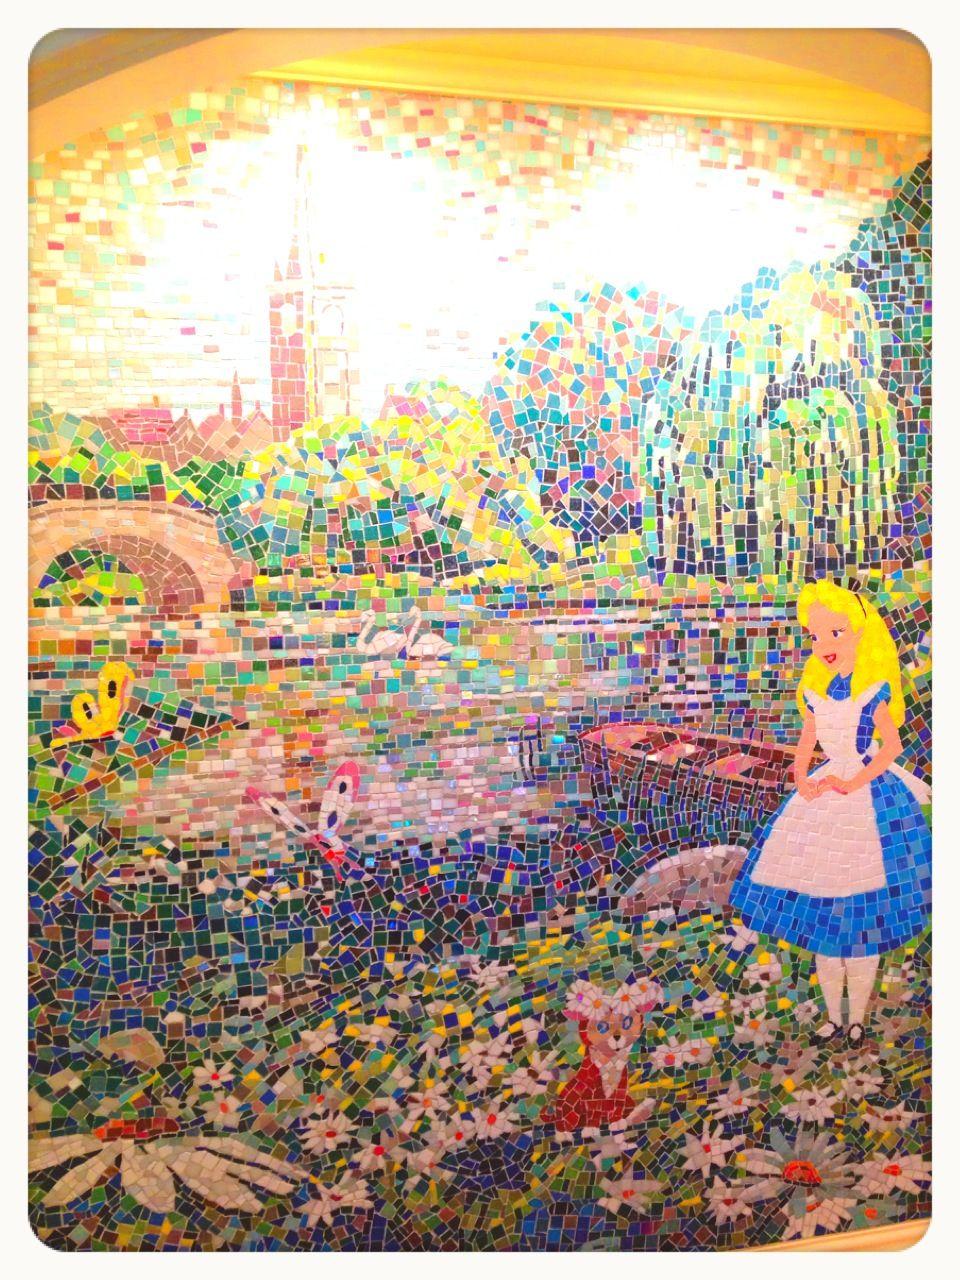 Alice mosaic at Tokyodisneyland Hotel